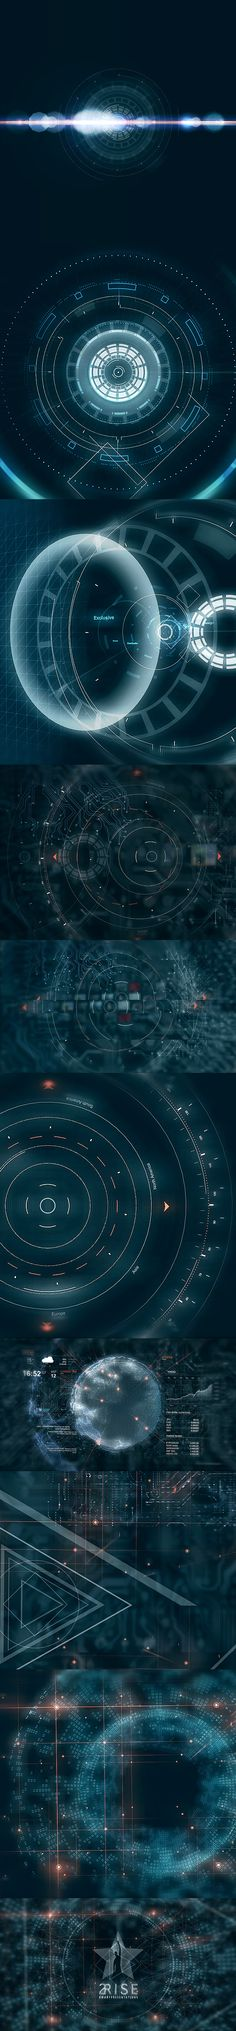 2RISE LOGO INTRO by Jedi88.deviantart.com on @DeviantArt